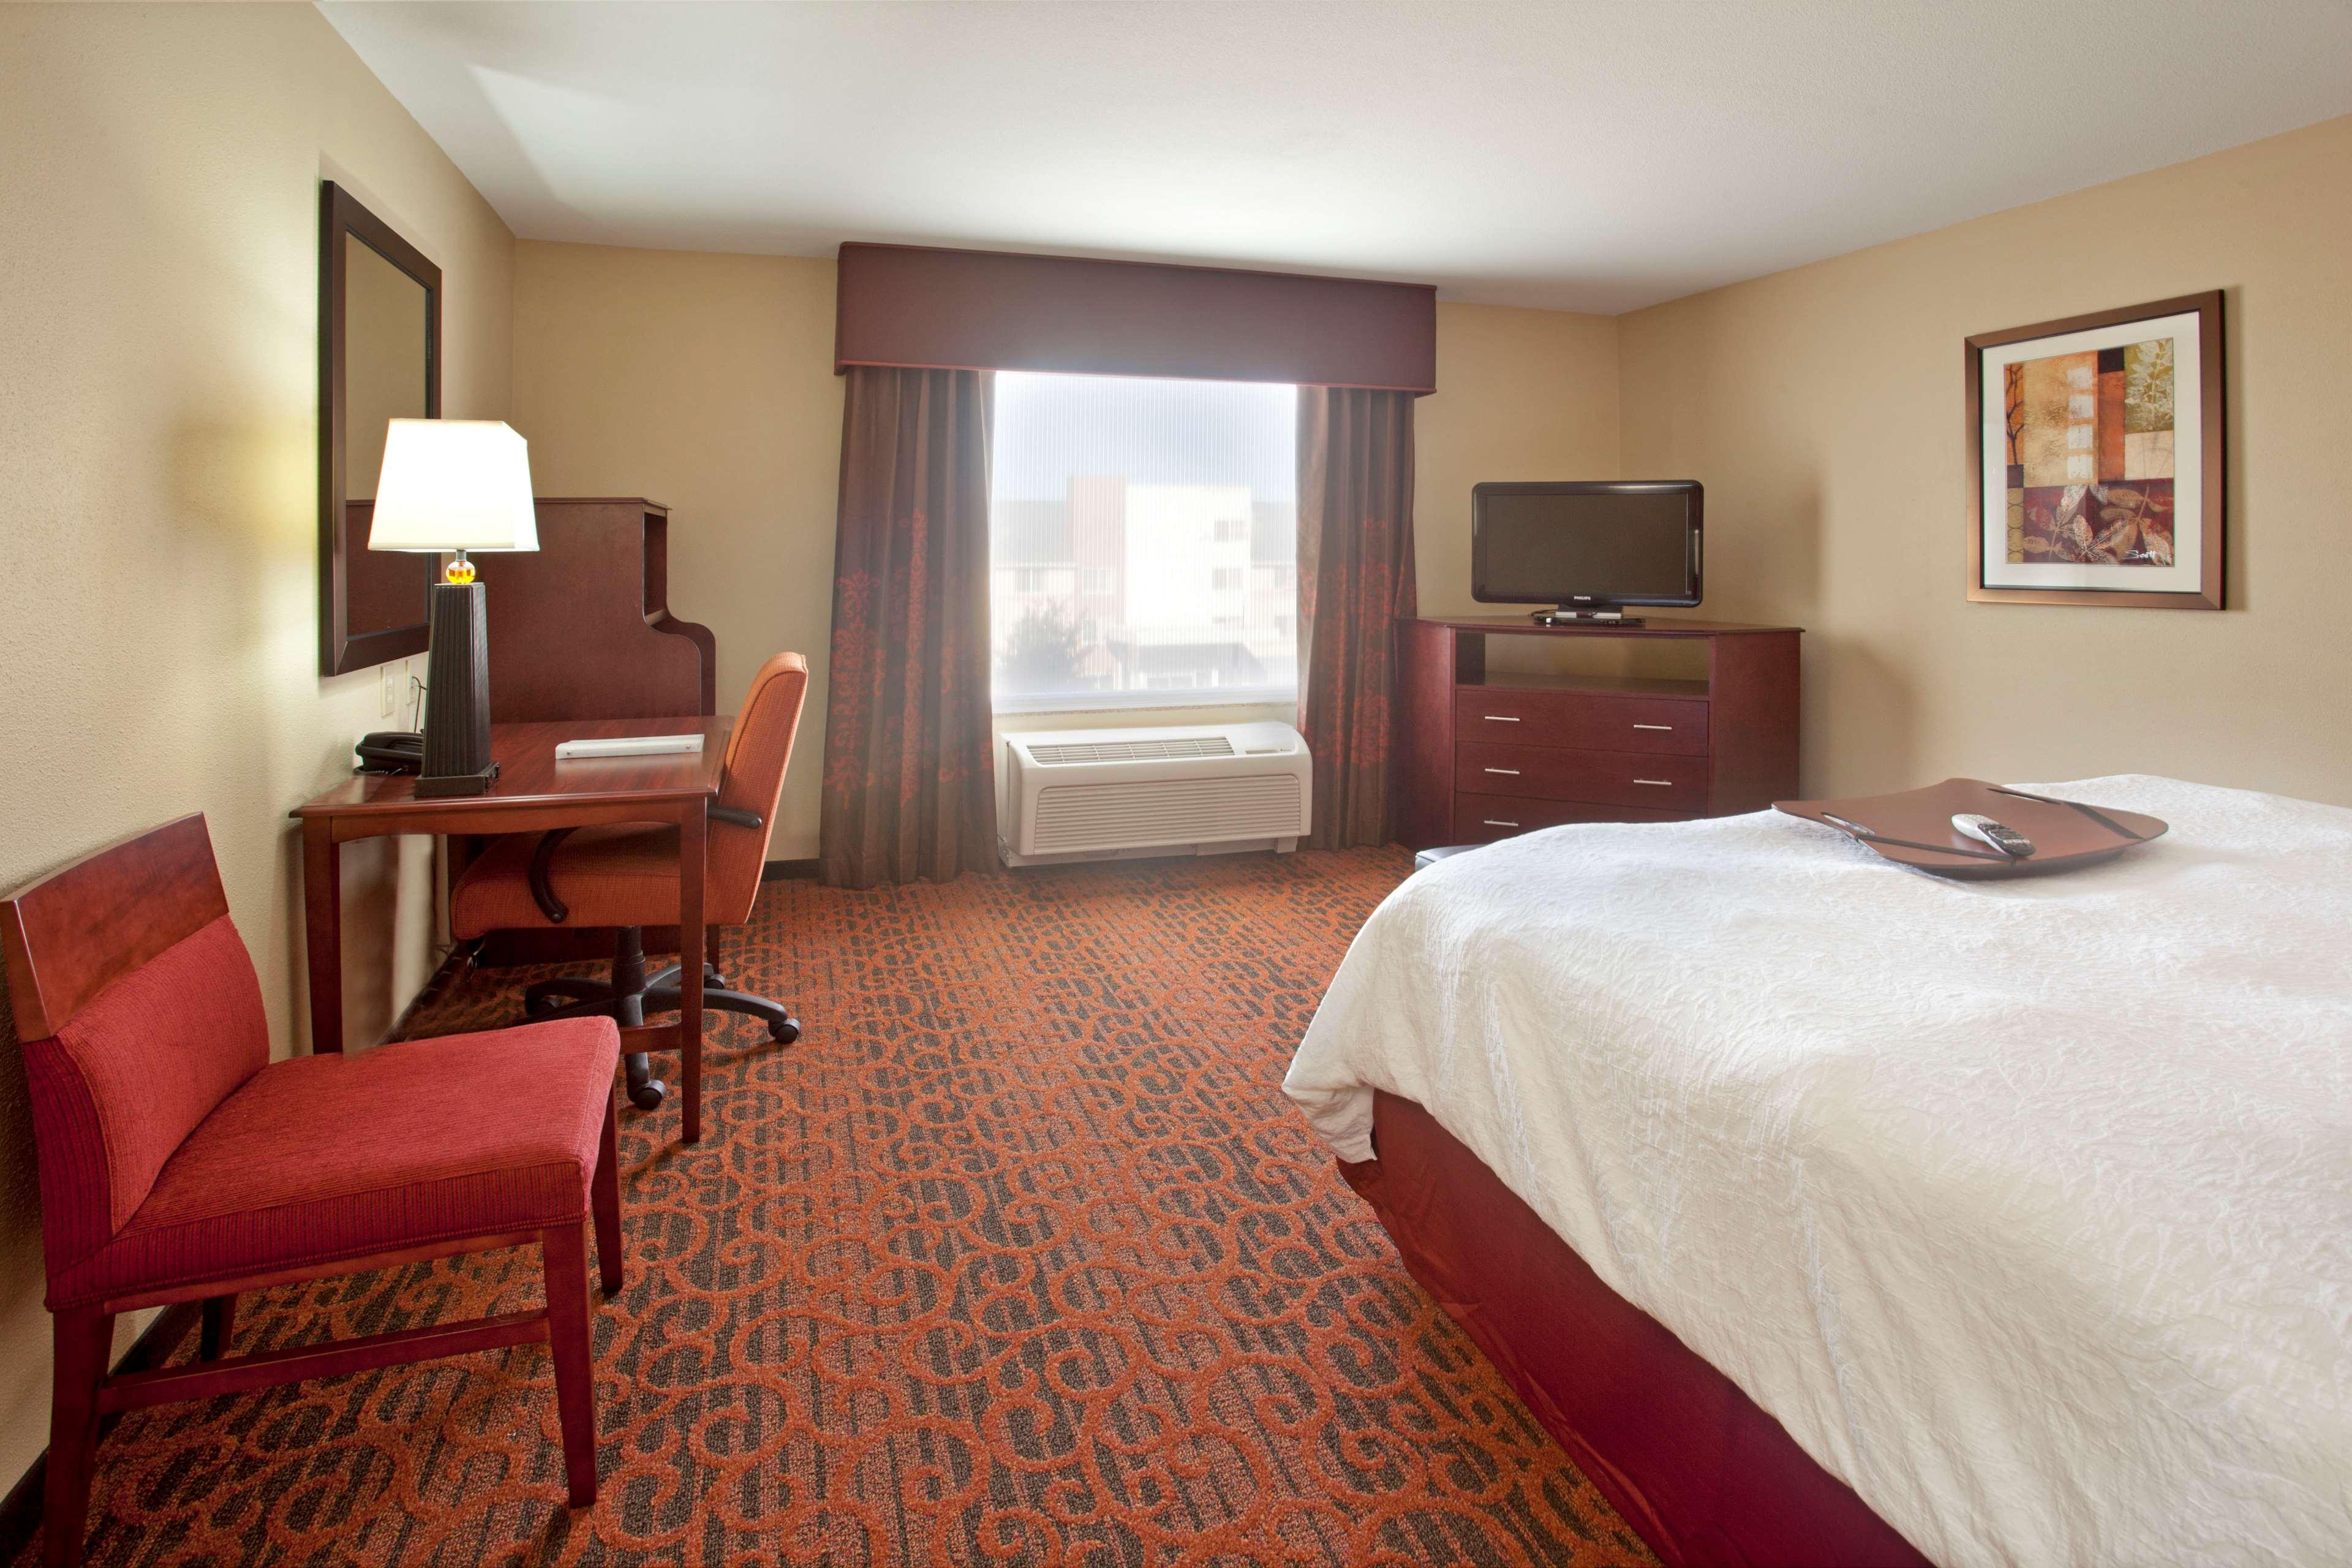 Hampton Inn & Suites Fort Worth-West-I-30 image 18